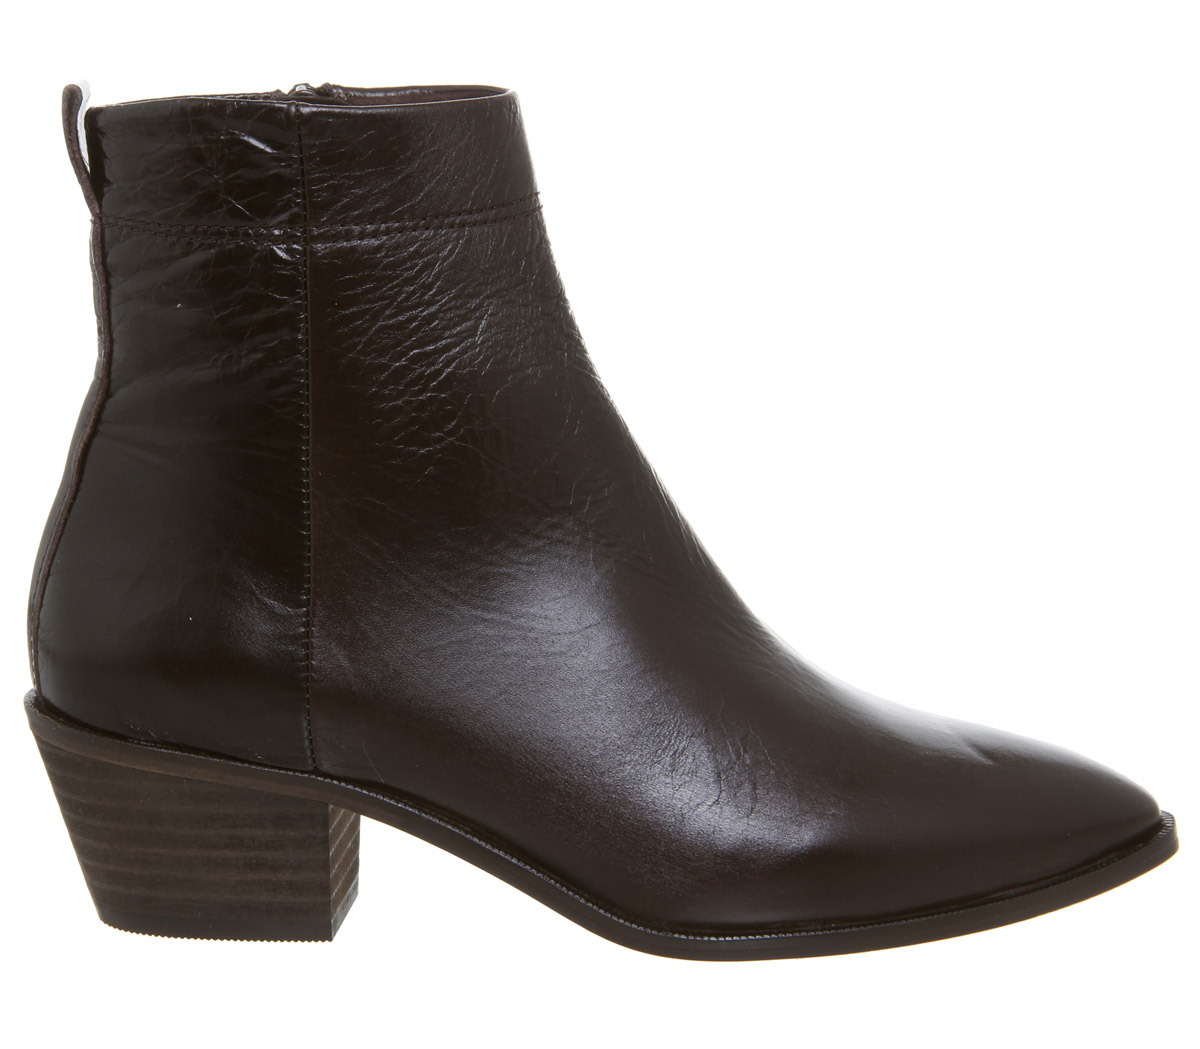 9557506e71 ... chocolate Botas para mujer Corte Oficina Amarillo Alto Botas de cuero,  ...